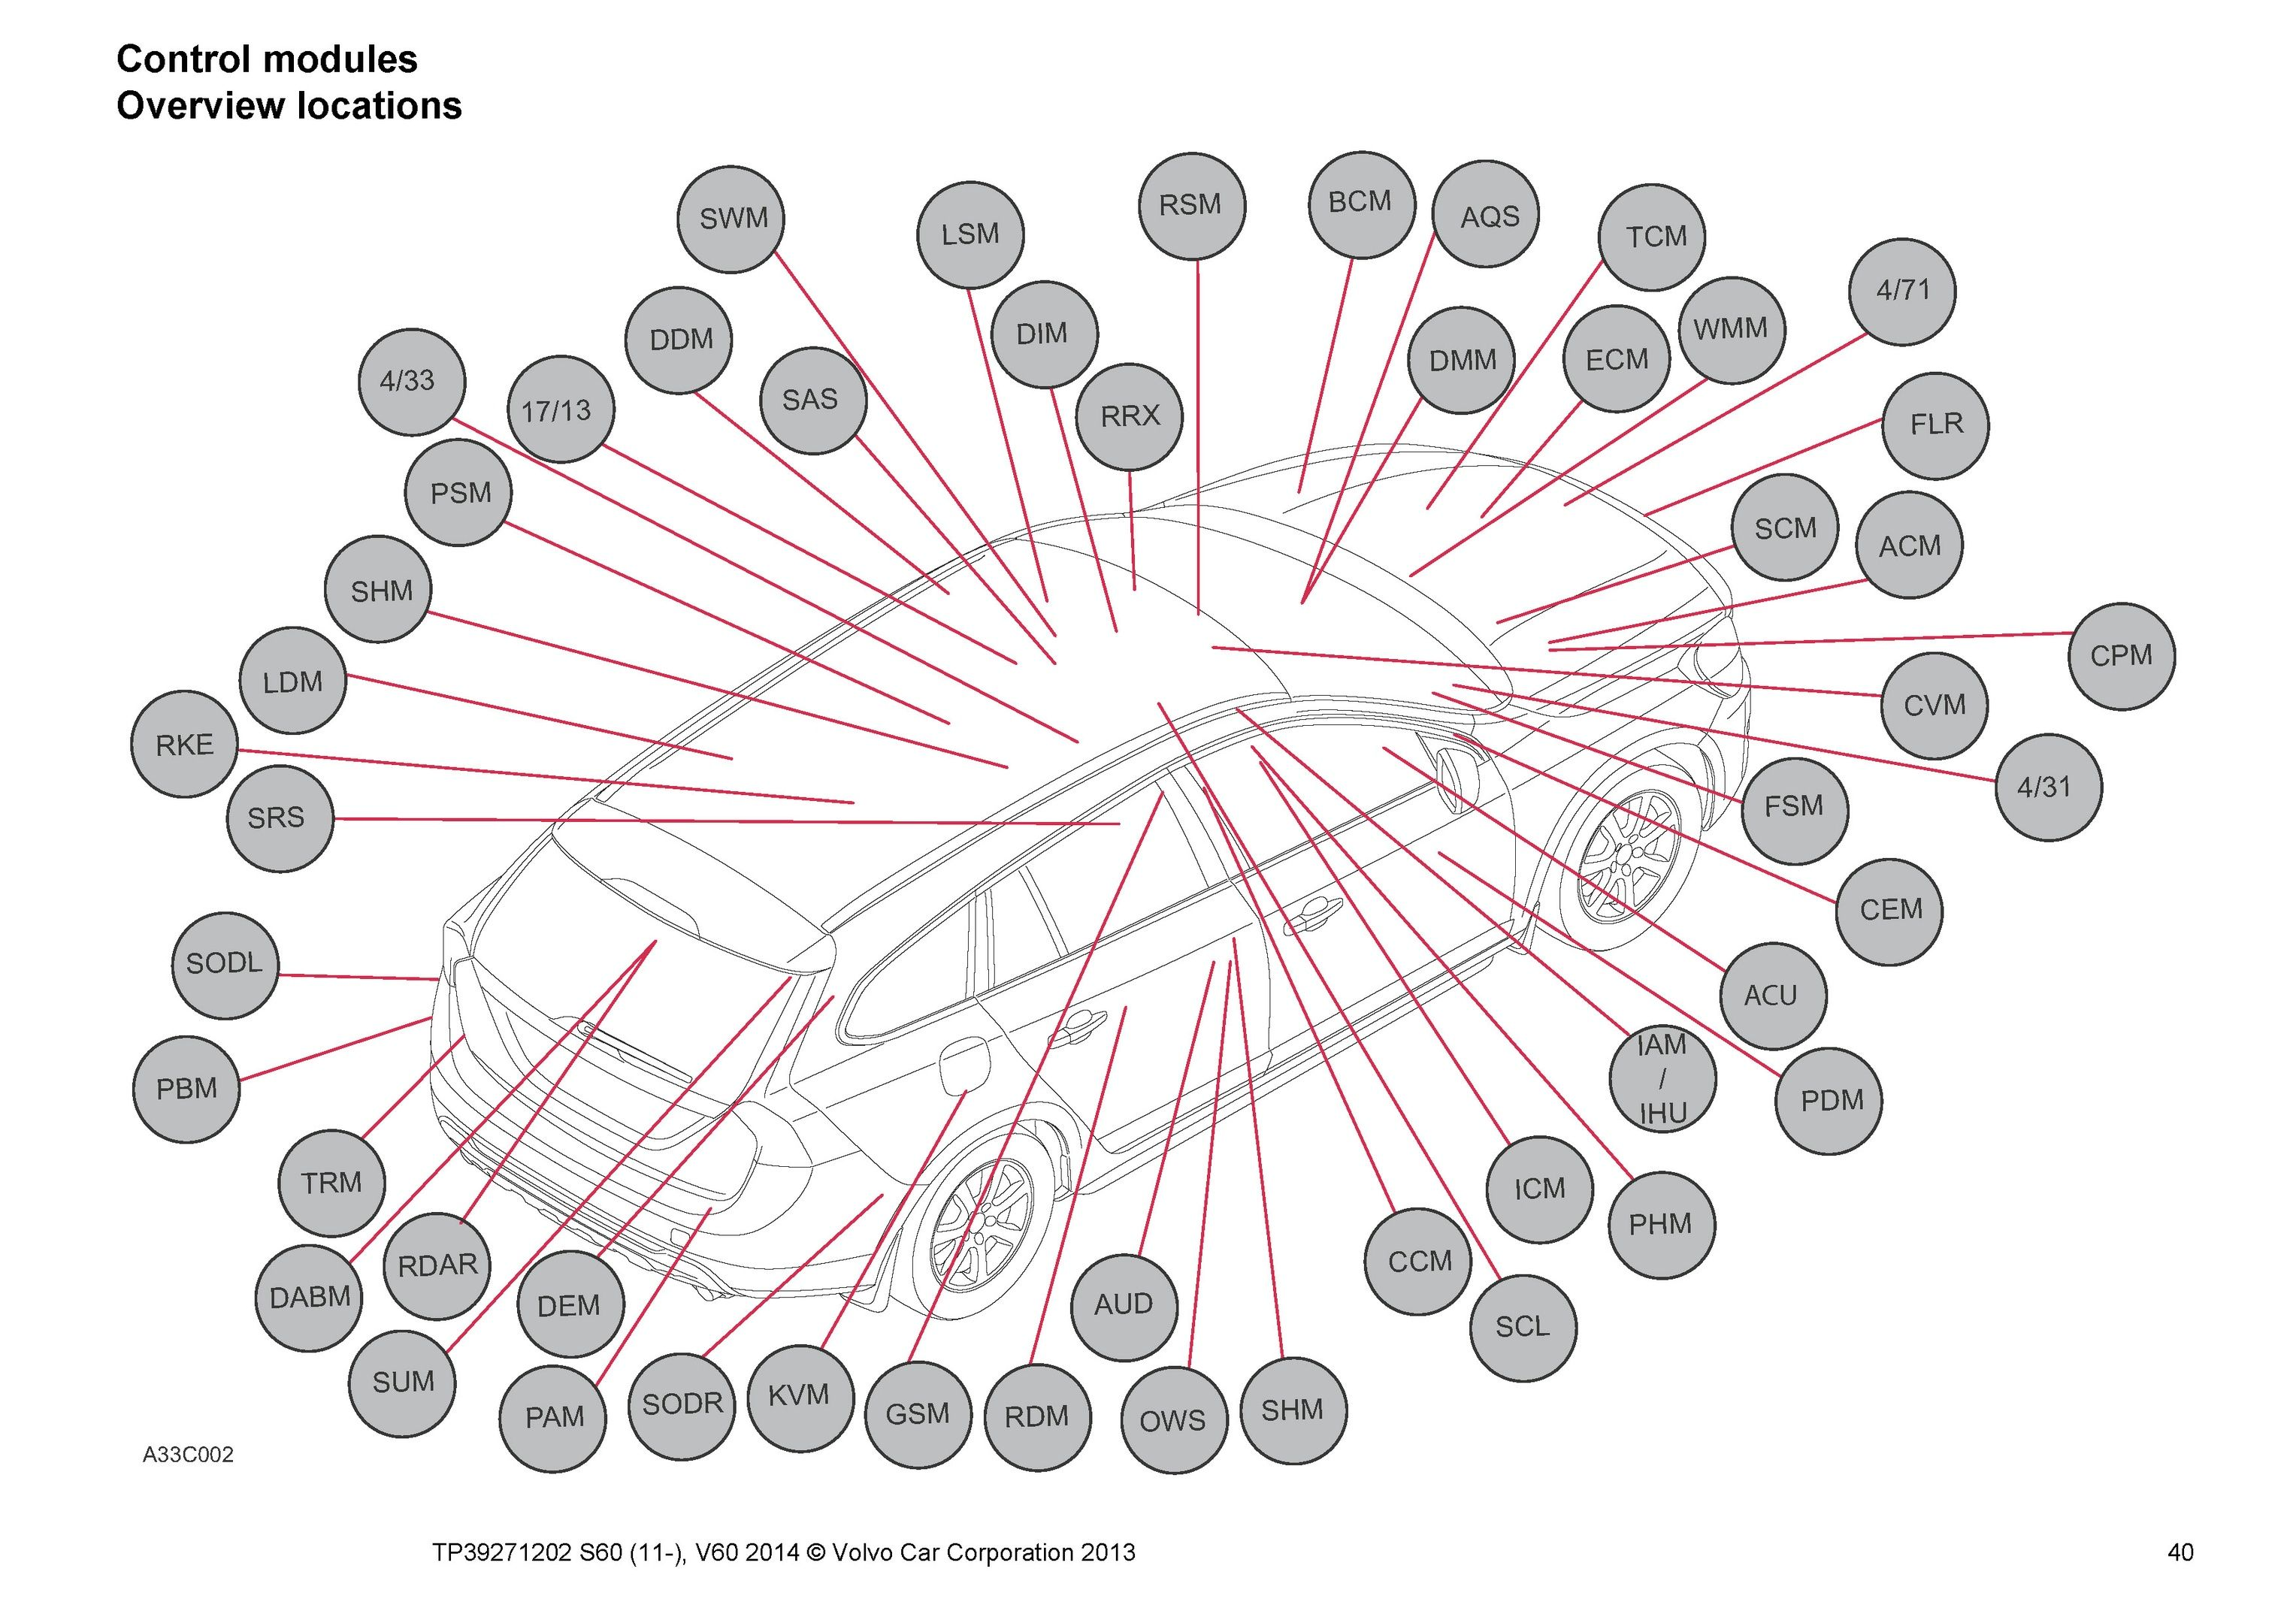 hight resolution of 2015 volvo s60 wiring diagram wiring diagram schema 2015 volvo s60 wiring diagram 2014 2015 volvo